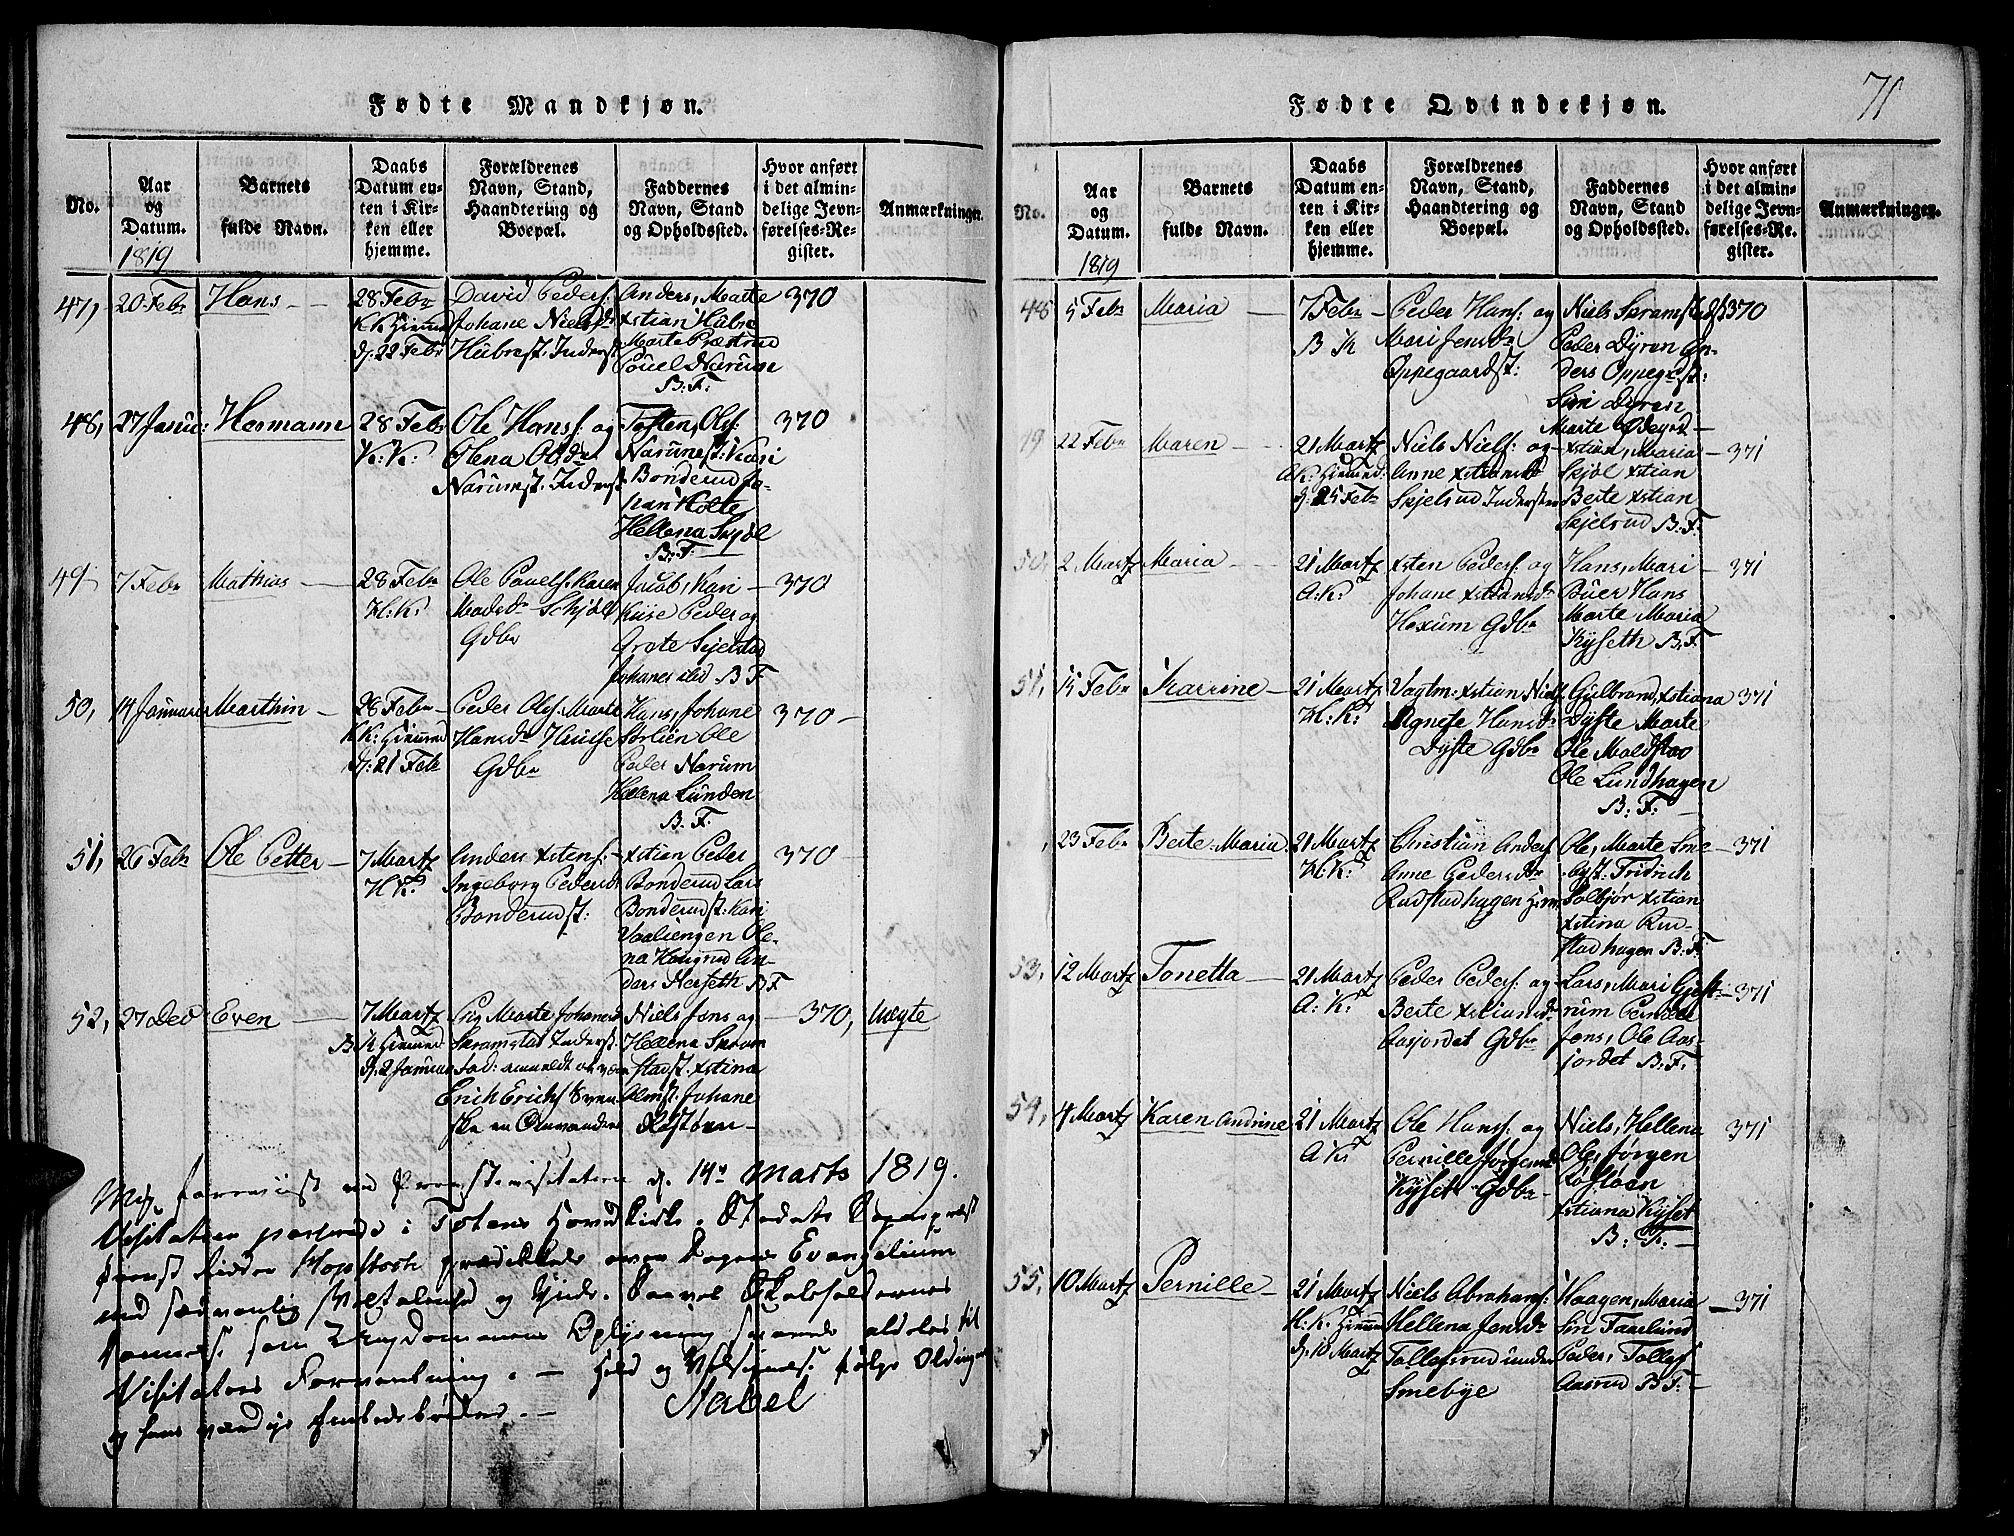 SAH, Toten prestekontor, Ministerialbok nr. 9, 1814-1820, s. 71